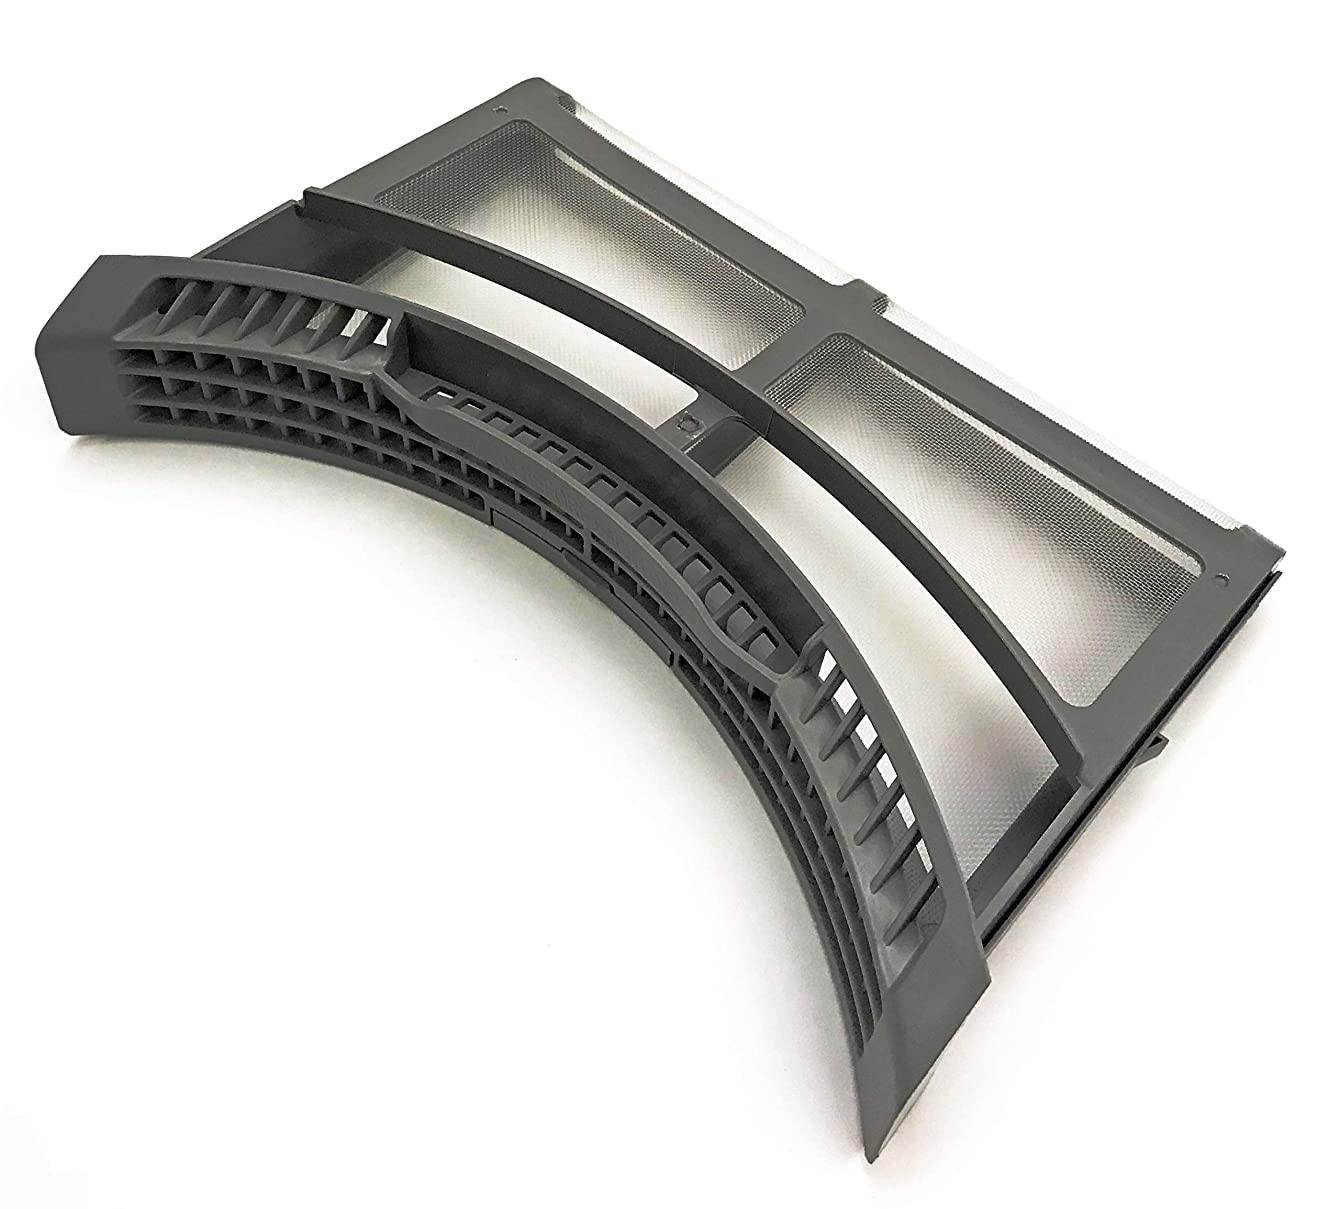 OEM Samsung Dryer Lint Filter Screen Supplied With DV45K6200GZ, DV45K6200GZ/A3, DV45K6500EV, DV45K6500EV/A3